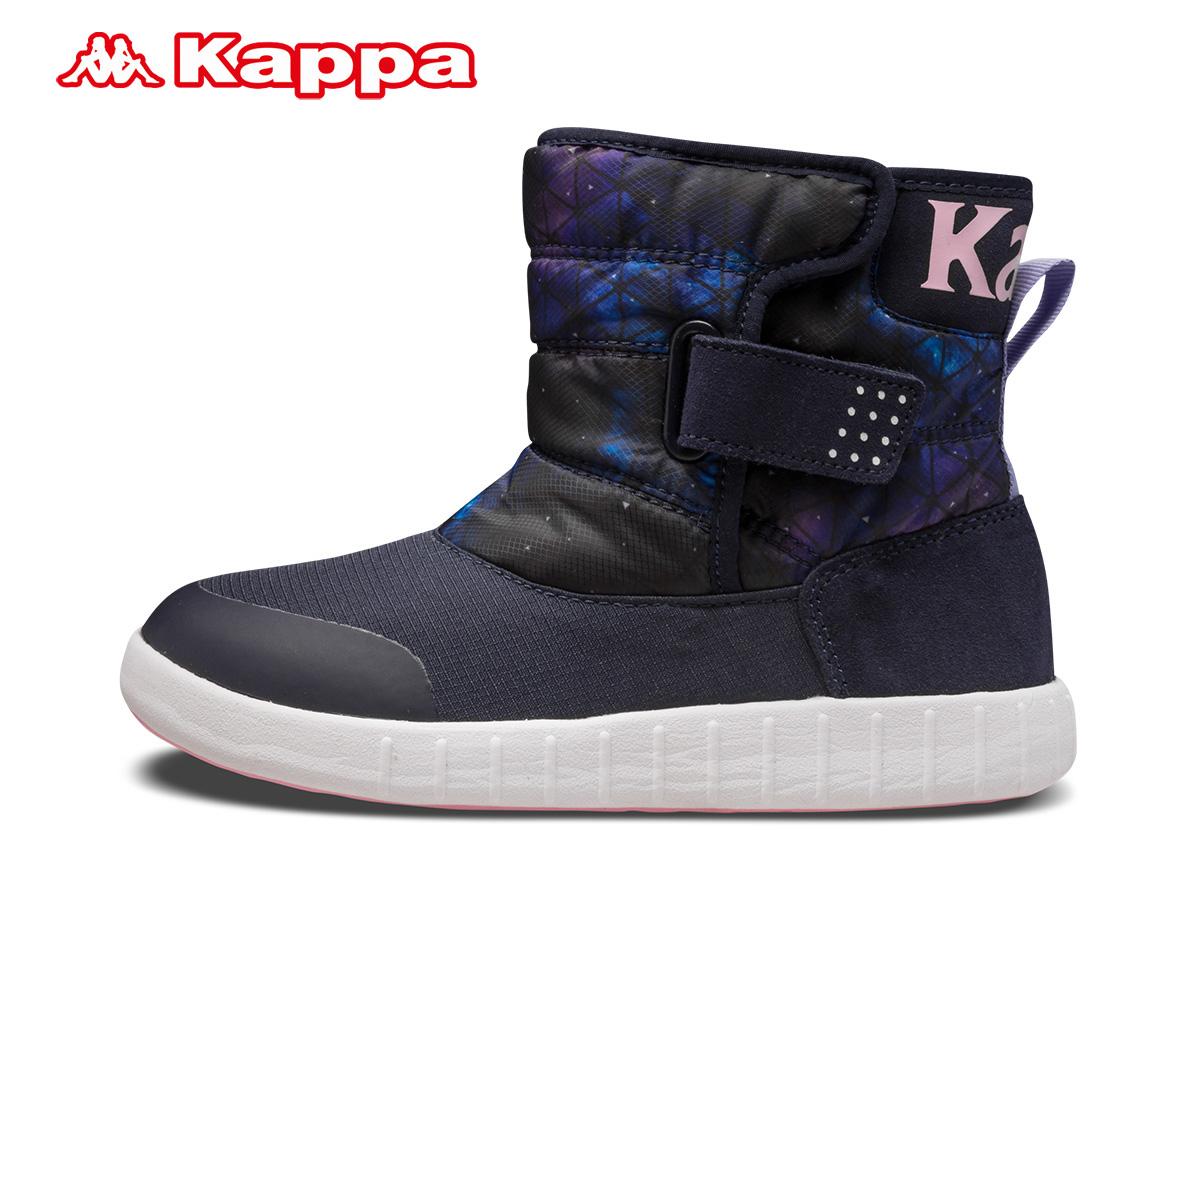 Kappa kids童装 新款男女童防滑加厚靴子 K07V5BB01